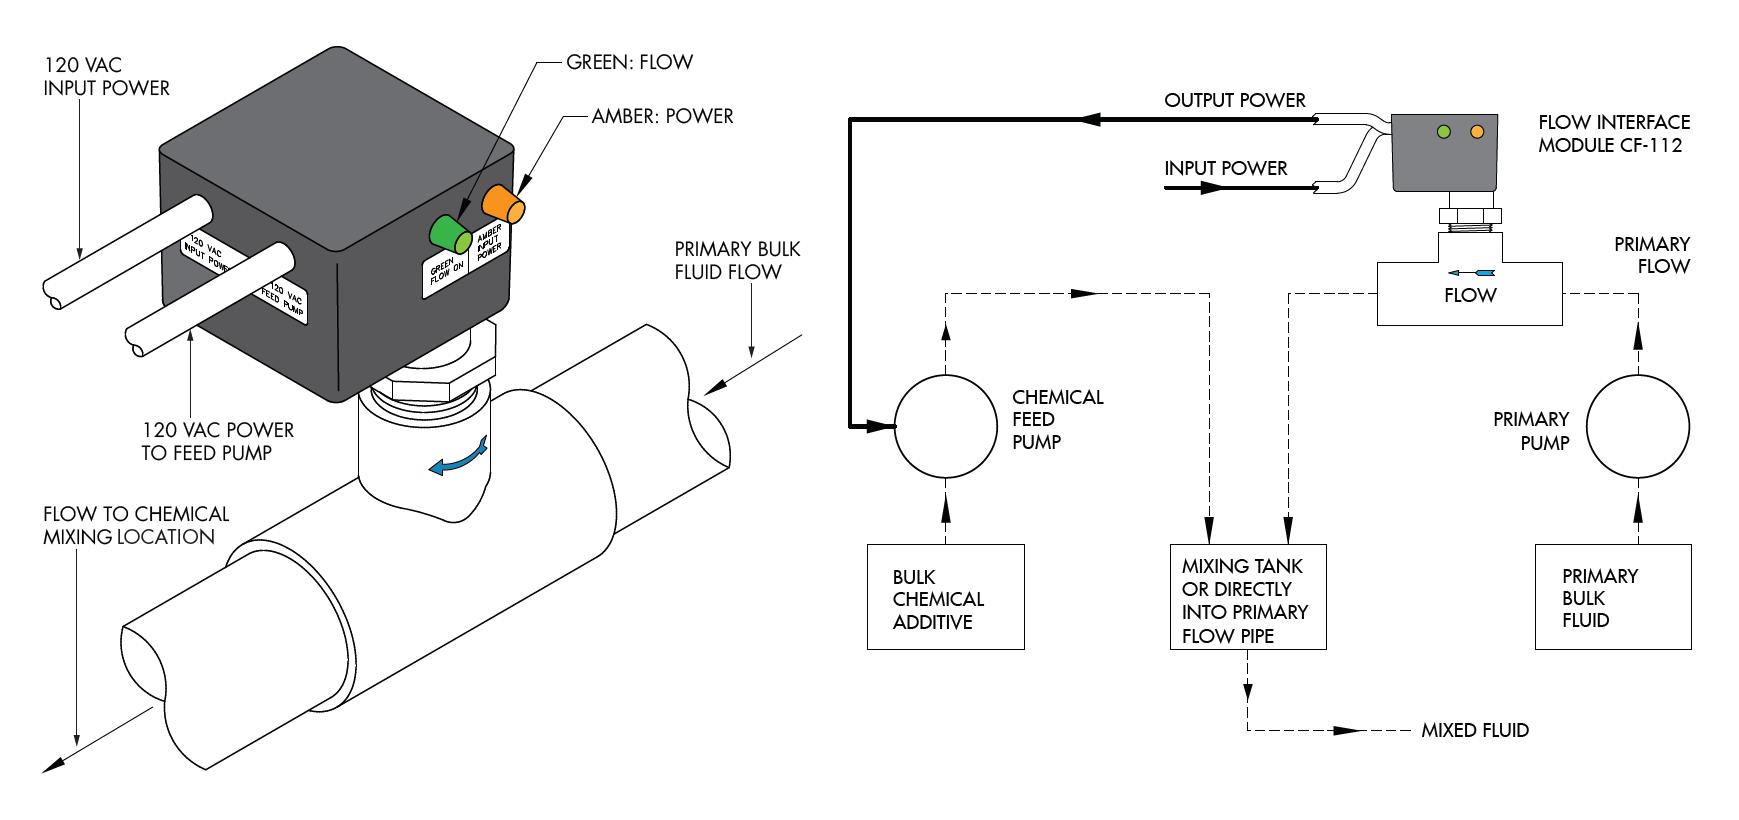 277 Vac Wiring Diagram 480 Vac Wiring Diagram Wiring